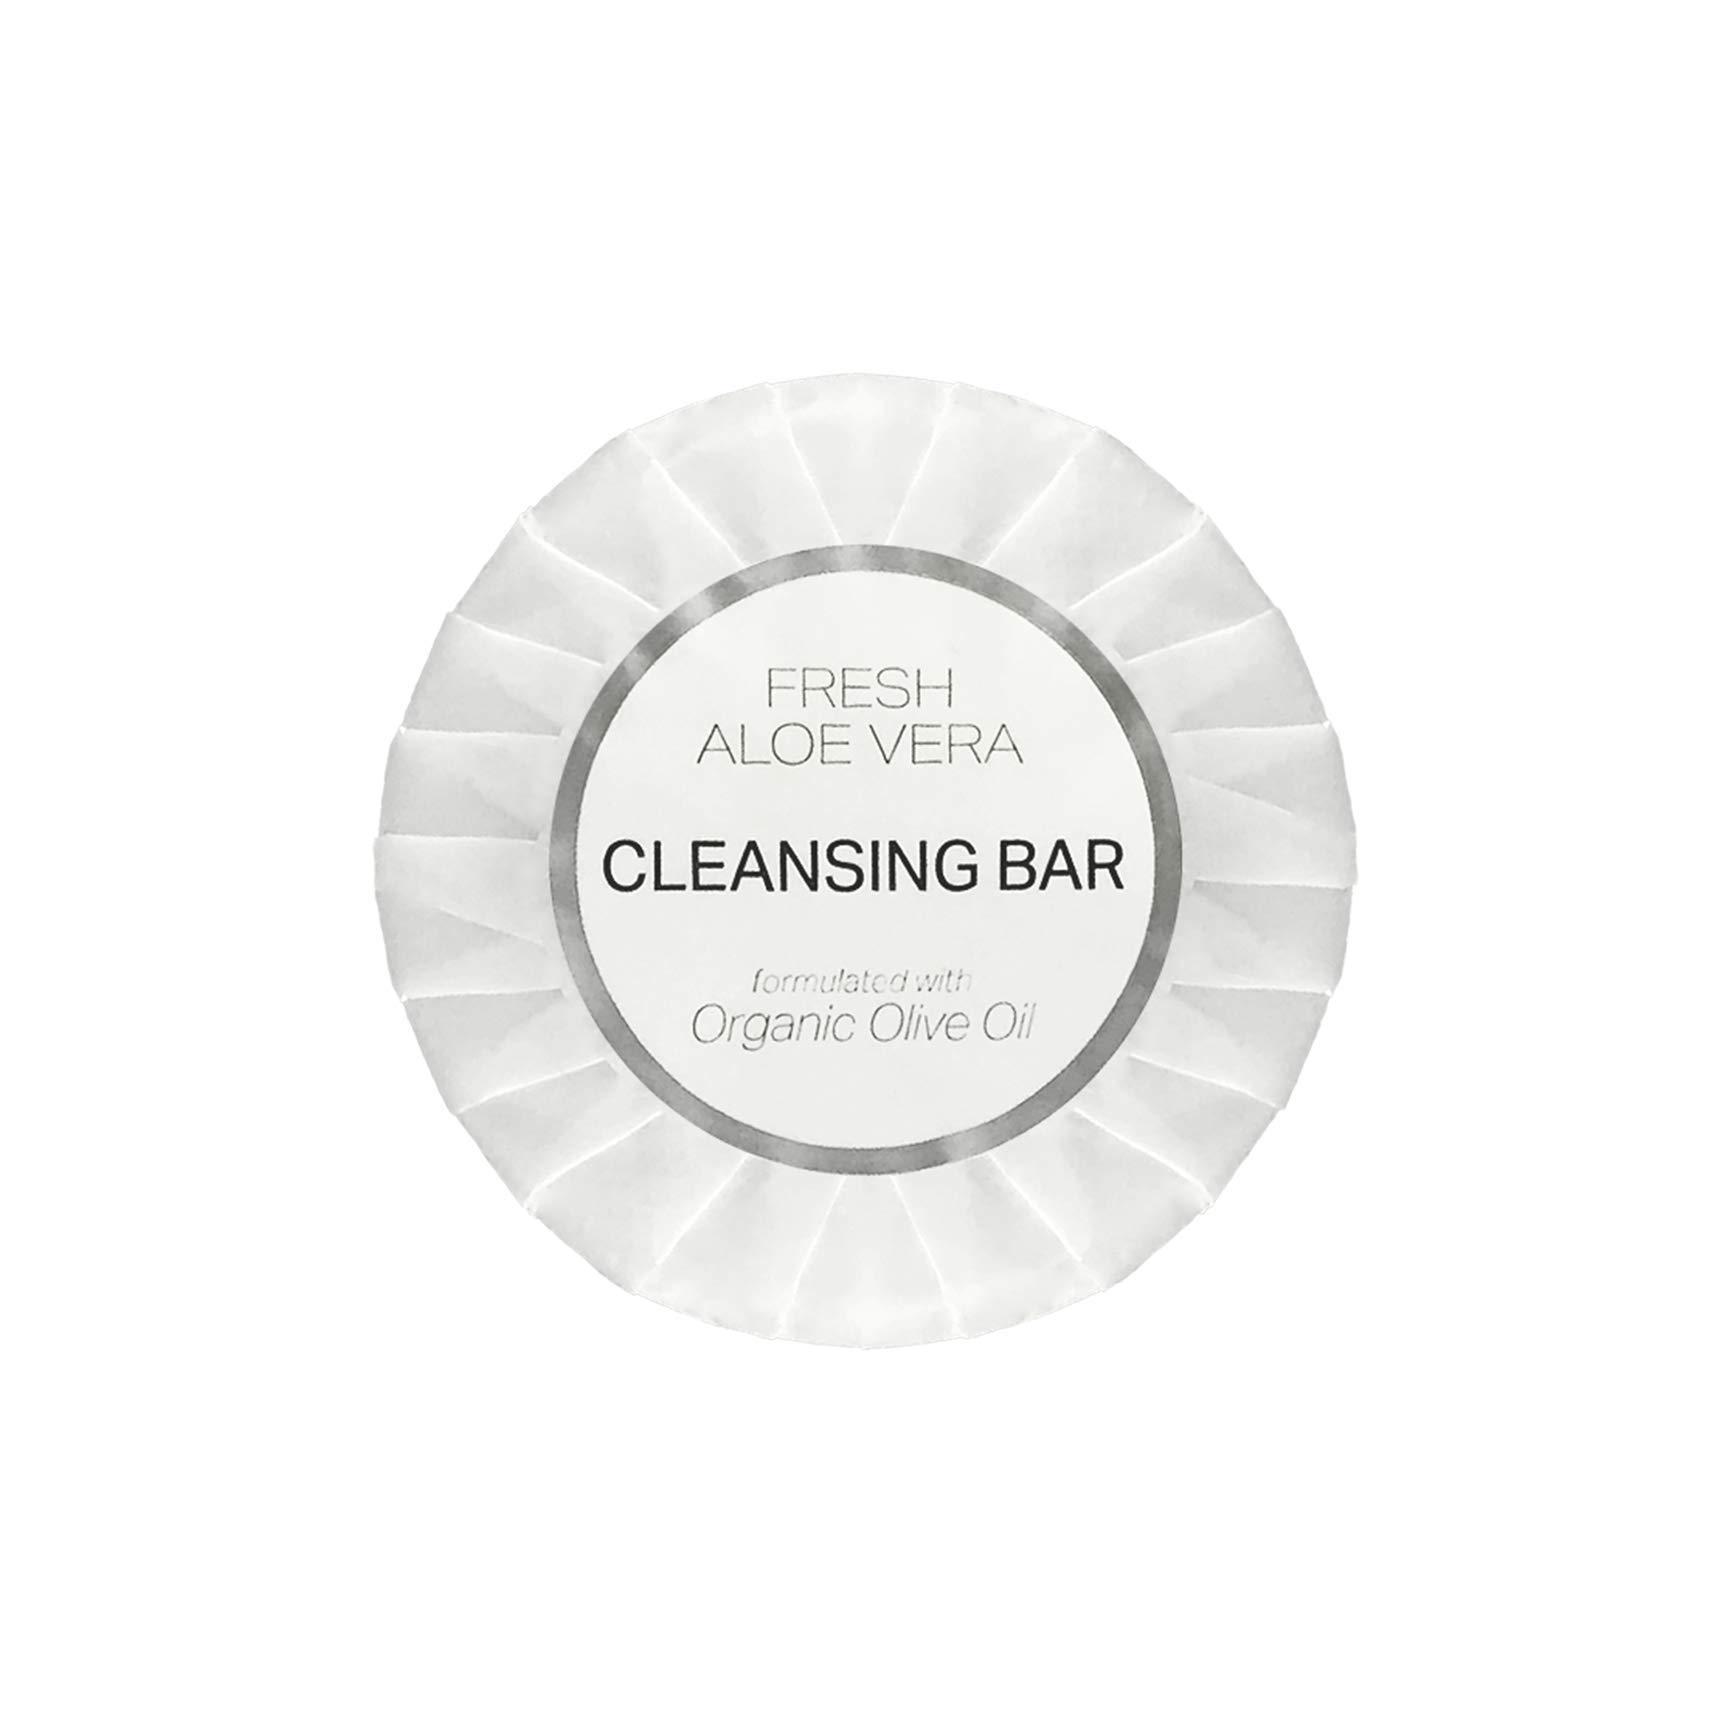 Diversified Hospitality White Aloe Vera Bar Soap, Travel Size Hotel Amenities, 1.25 oz (Case of 288)